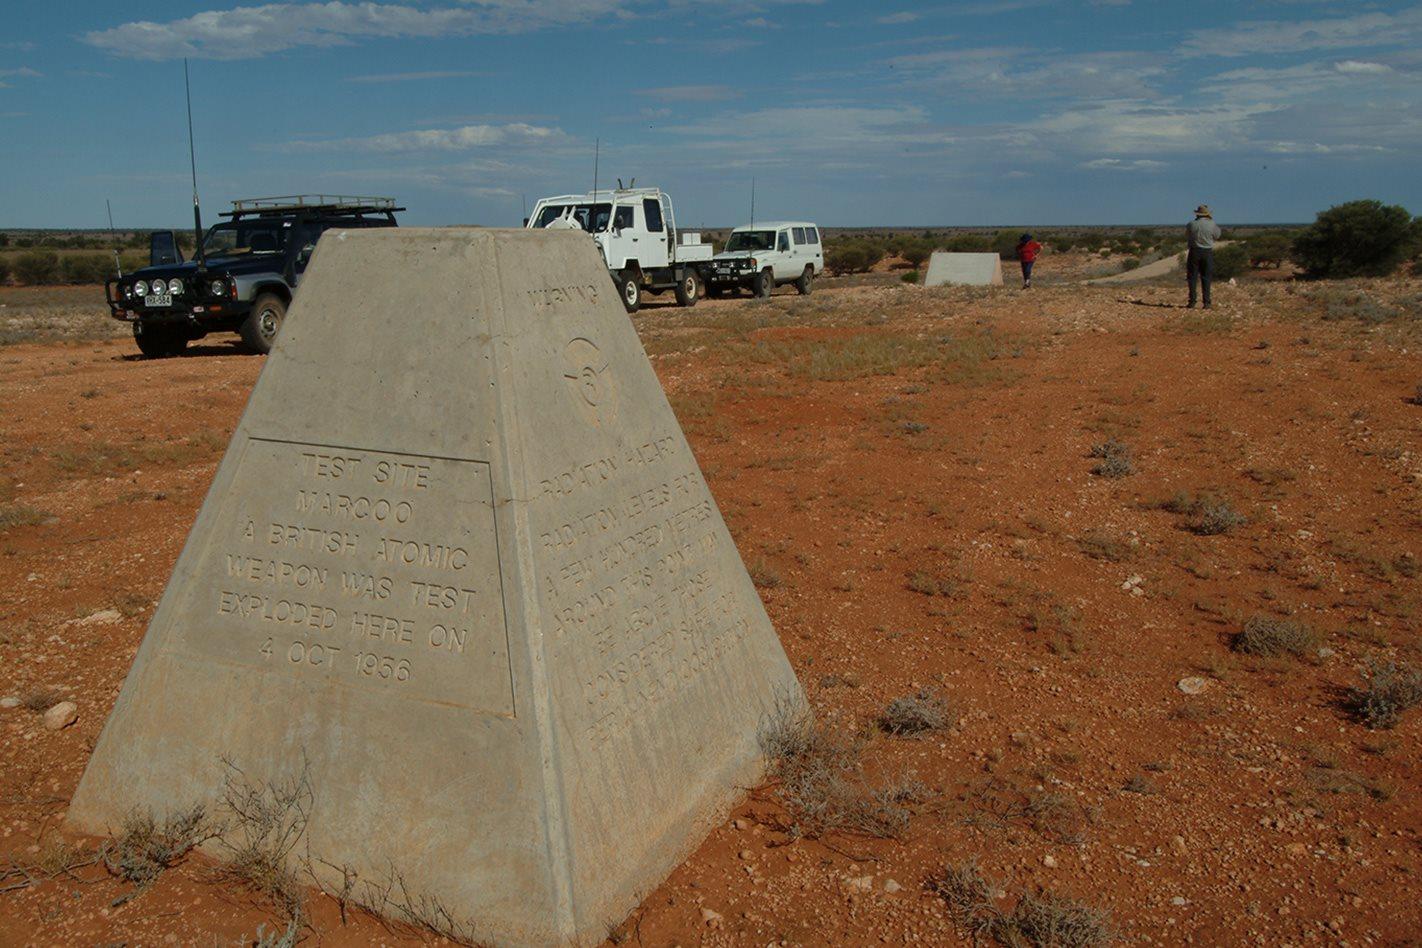 Attomic bomb testing site Maralinga